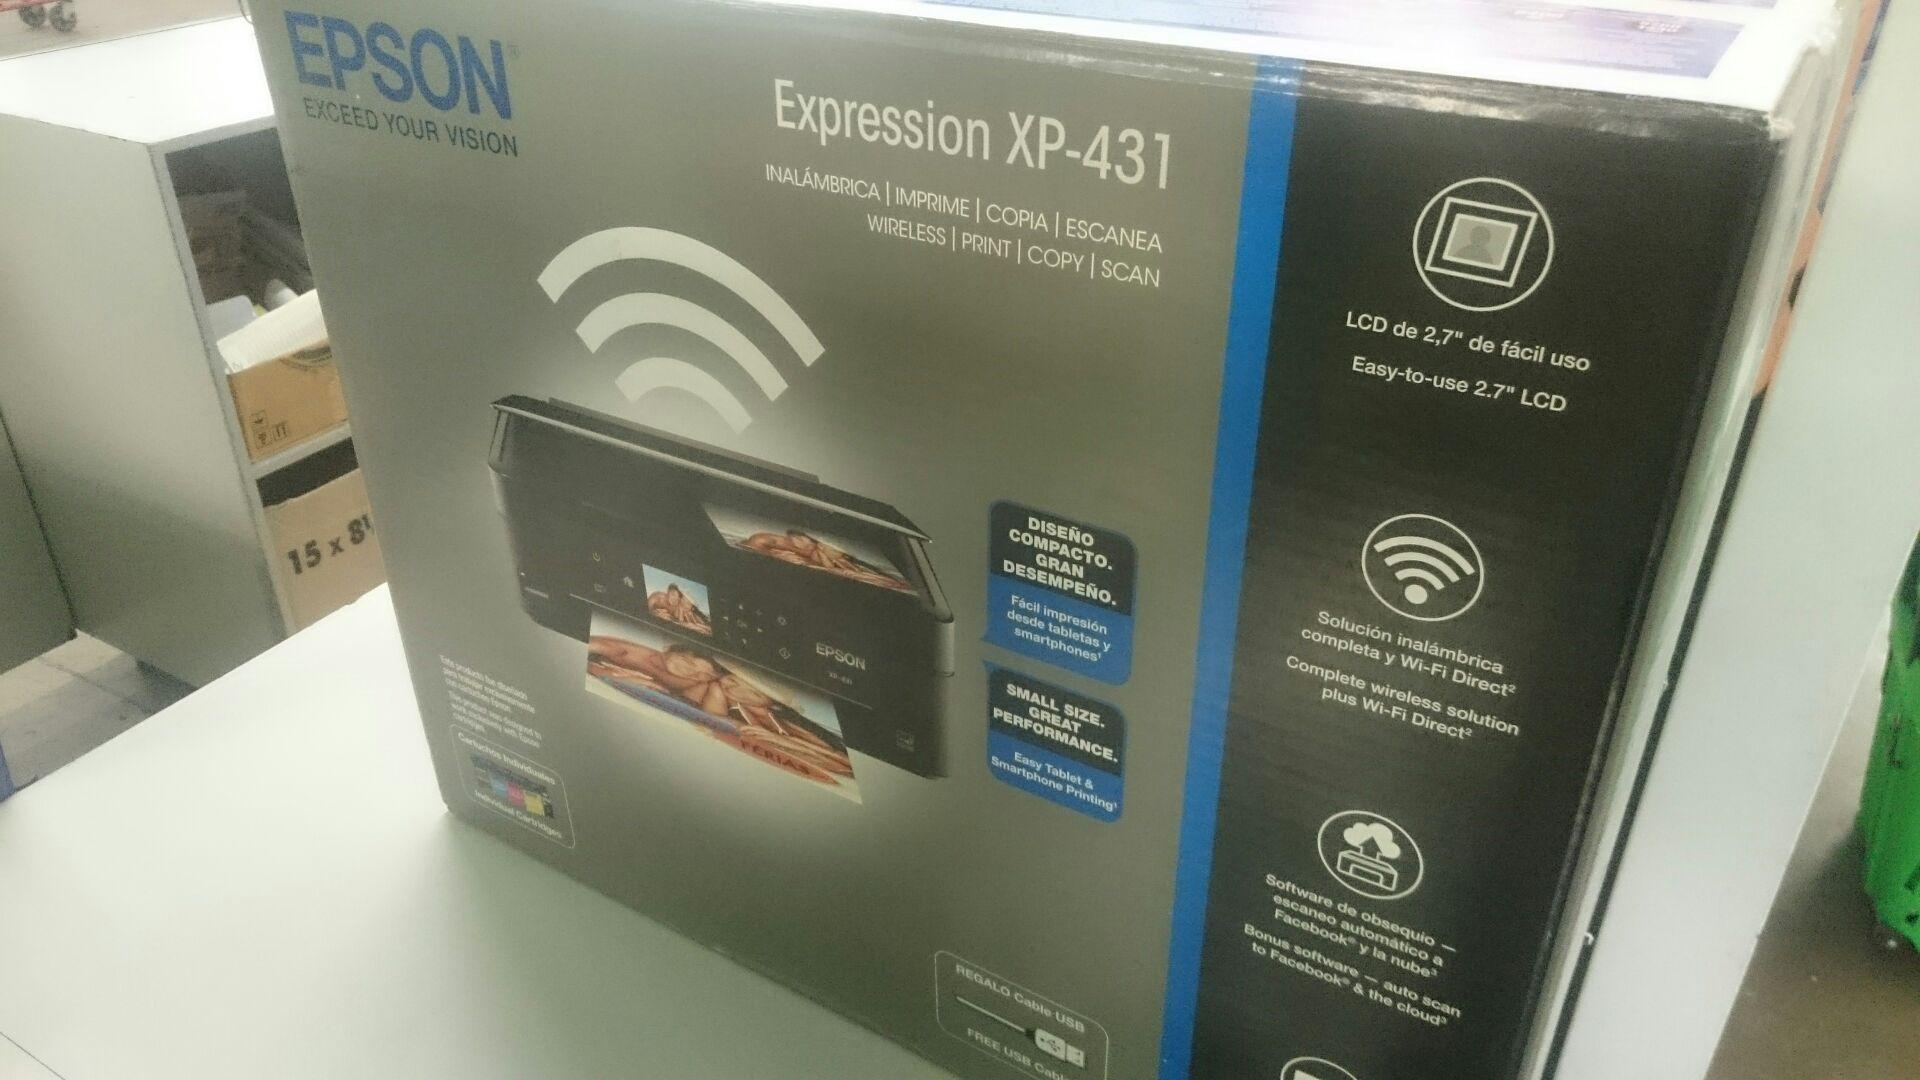 Bodega Aurrerá: impresora multifuncional Epson XP-431 a $198.03 (MI PRIMER PROMONOVELA)